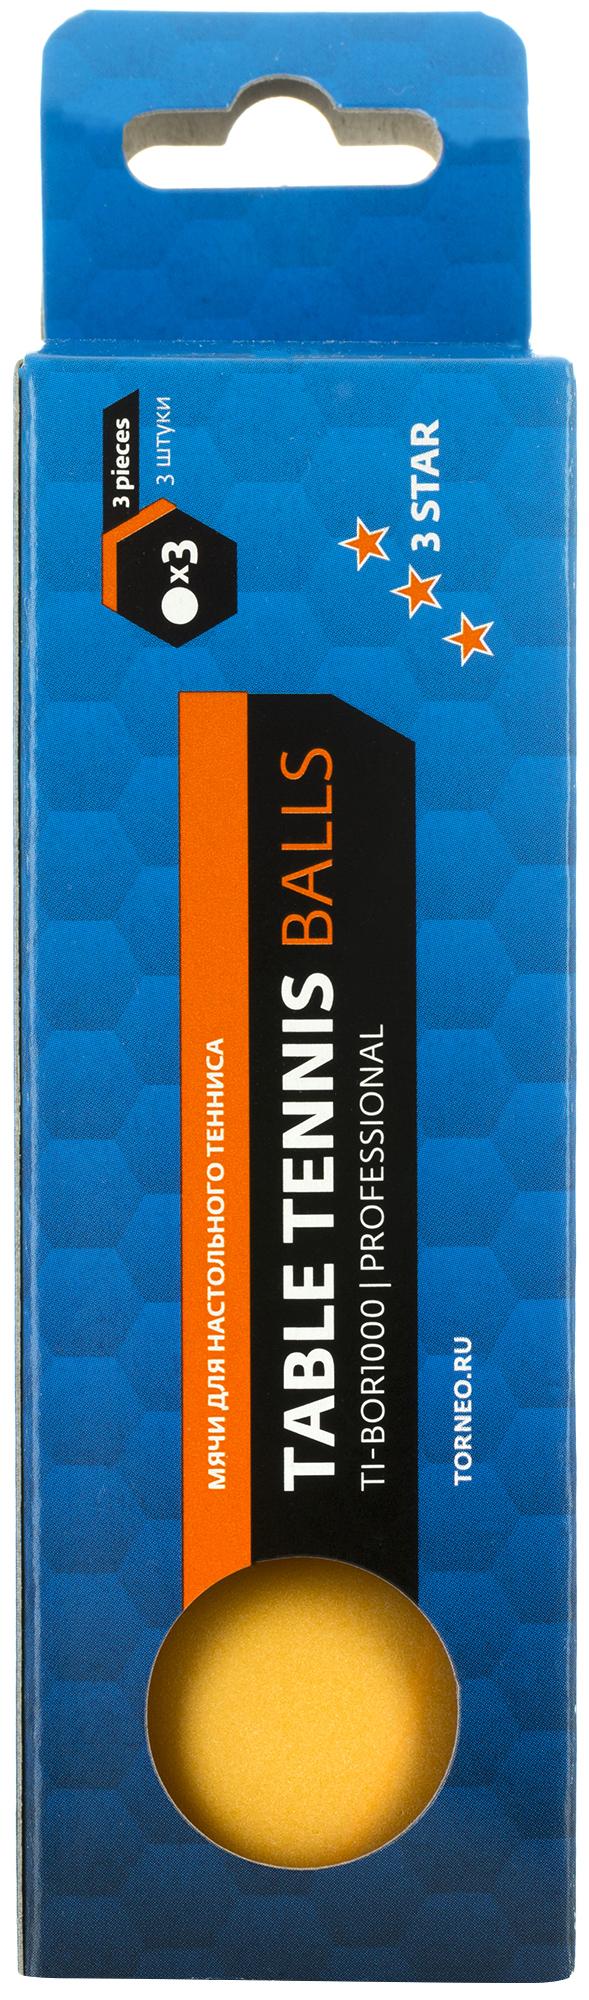 все цены на Torneo Мячи для настольного тенниса Torneo, 3 шт. онлайн